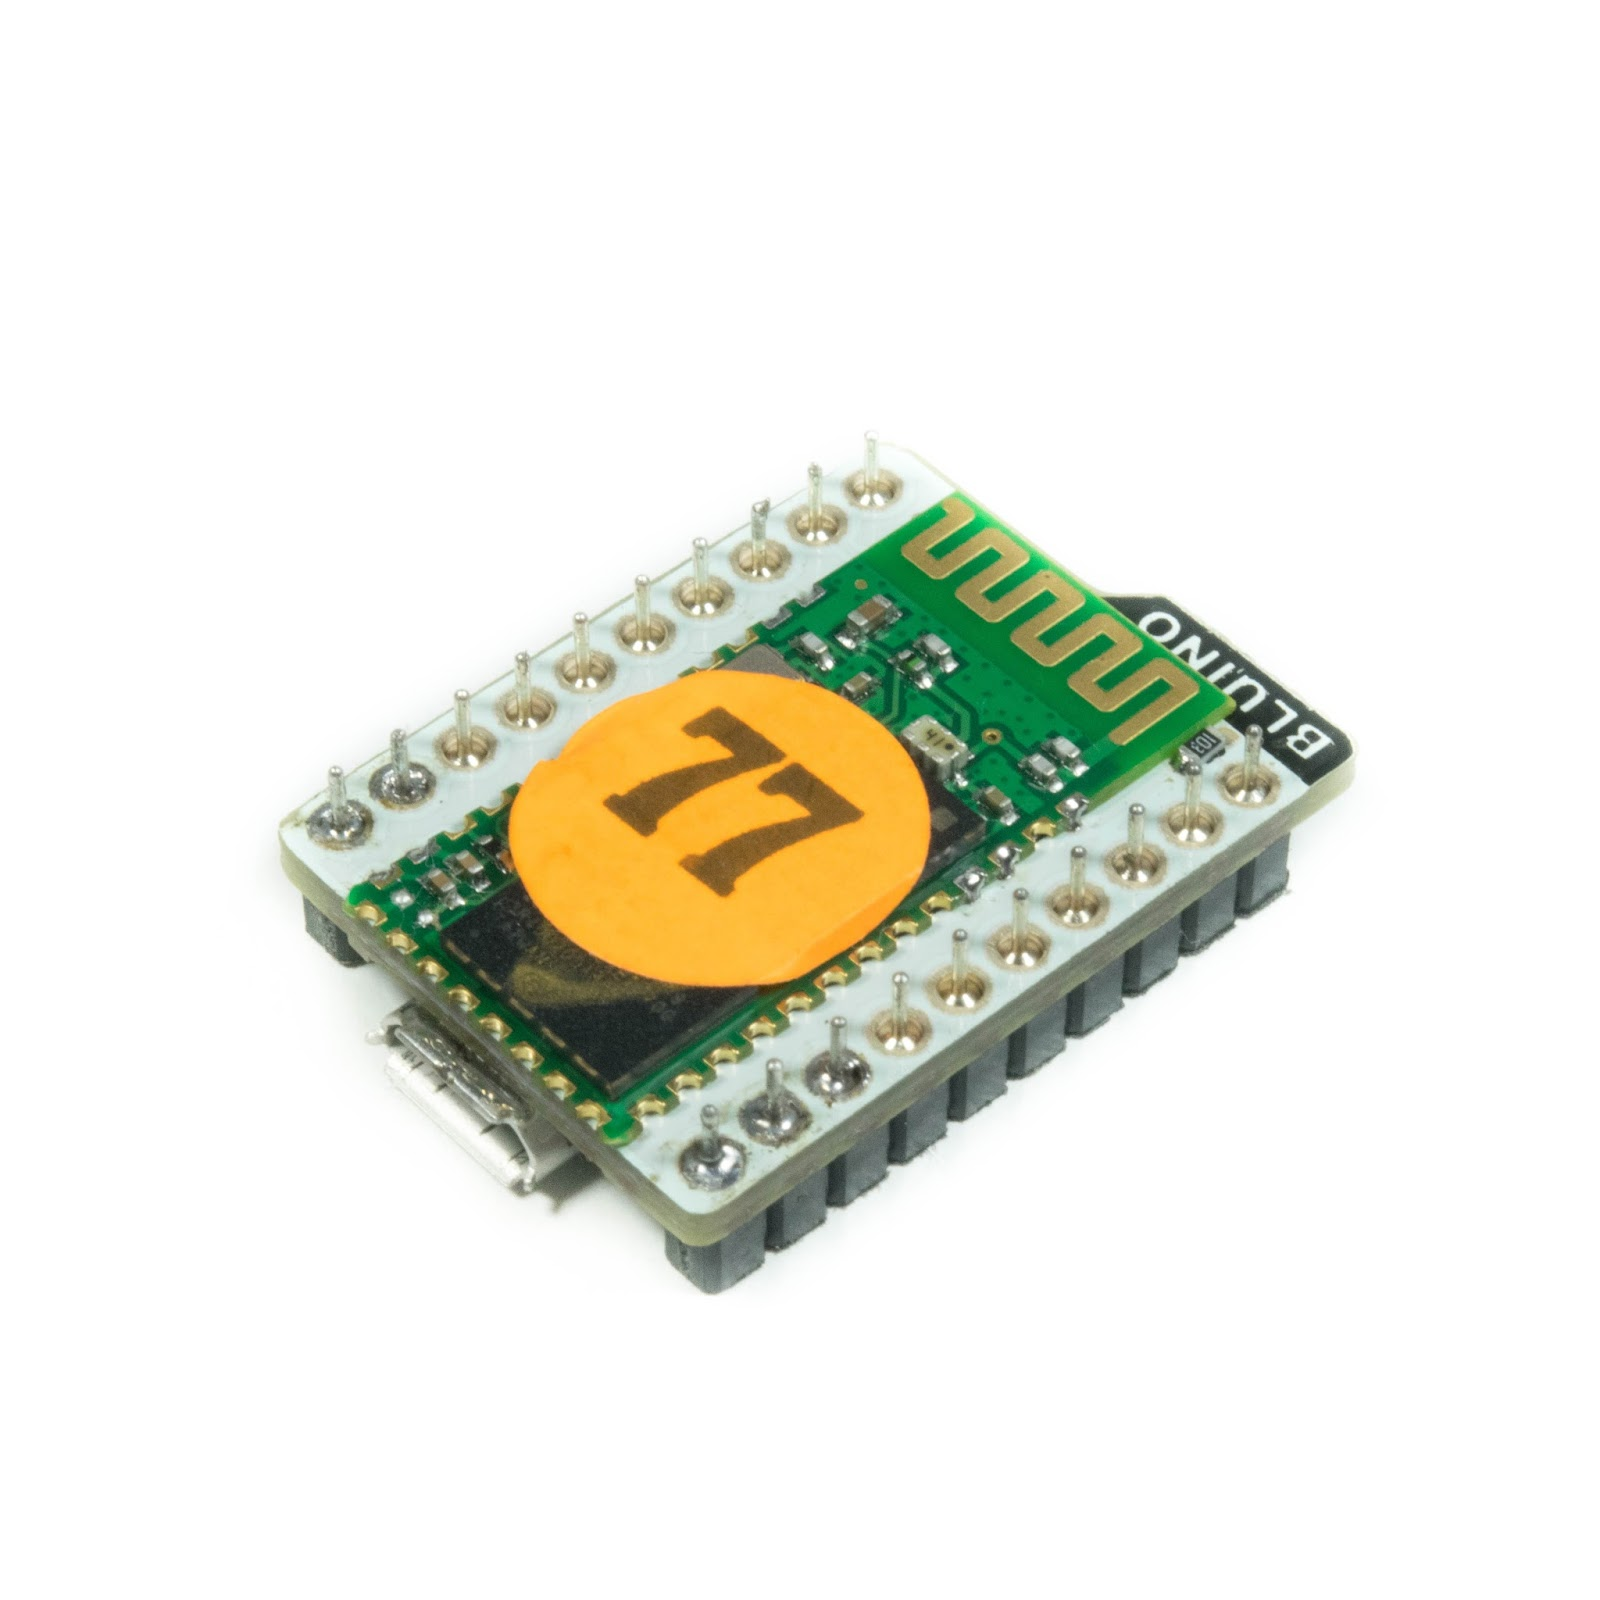 Bluino Electronics Relay 5v 5 Pin Biru Harga Idr235000